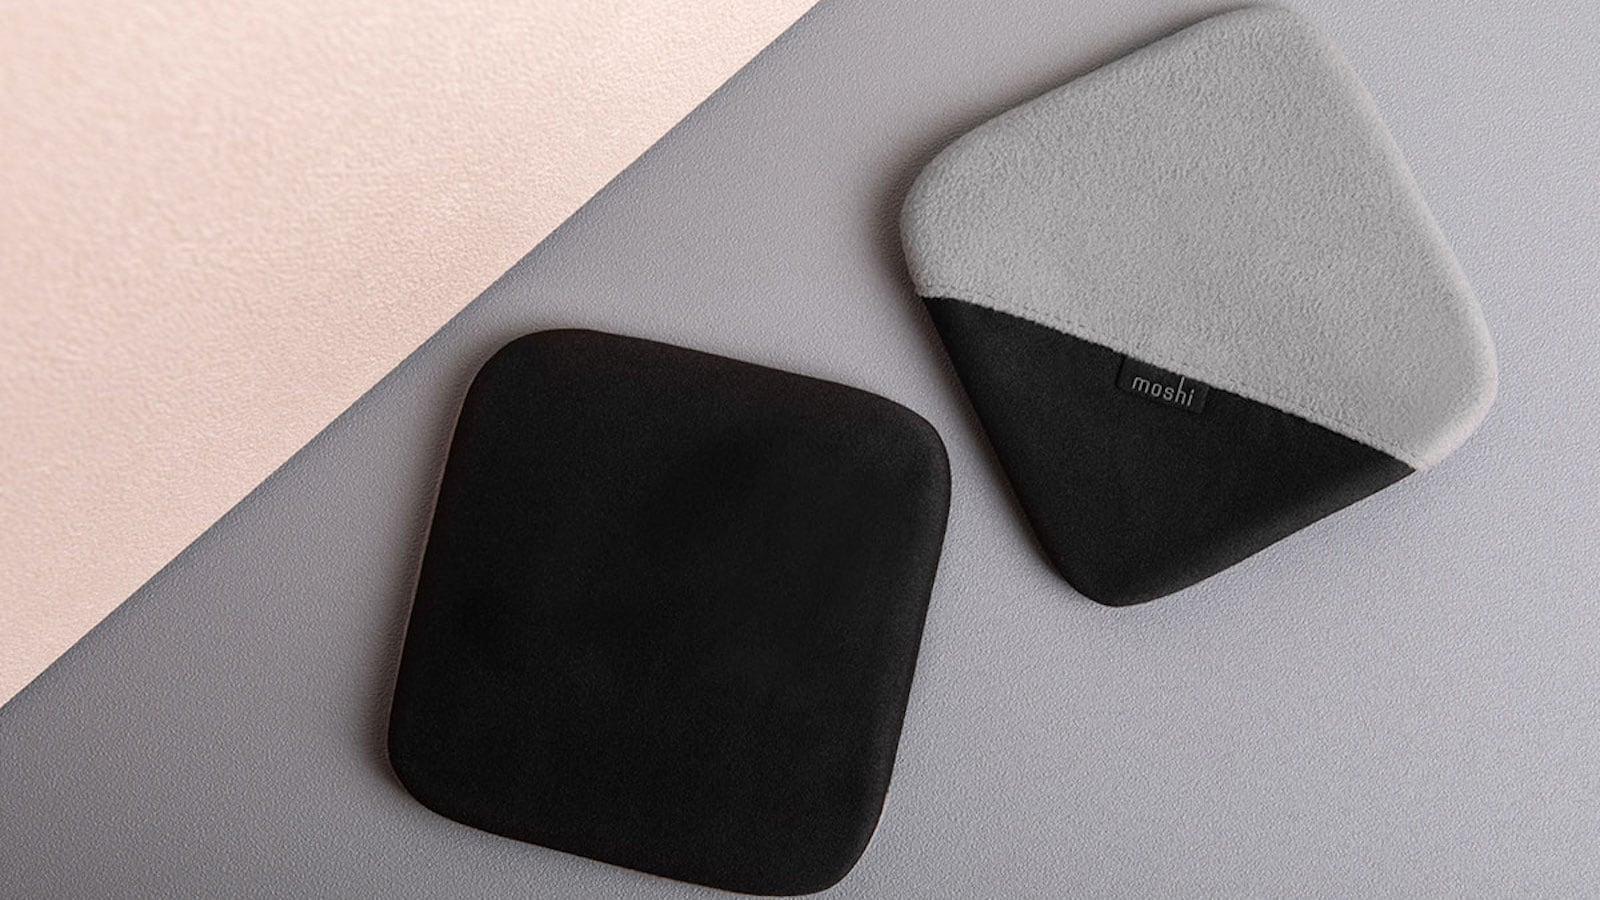 Moshi TeraGlove Microfiber Screen Cleaner Cloth